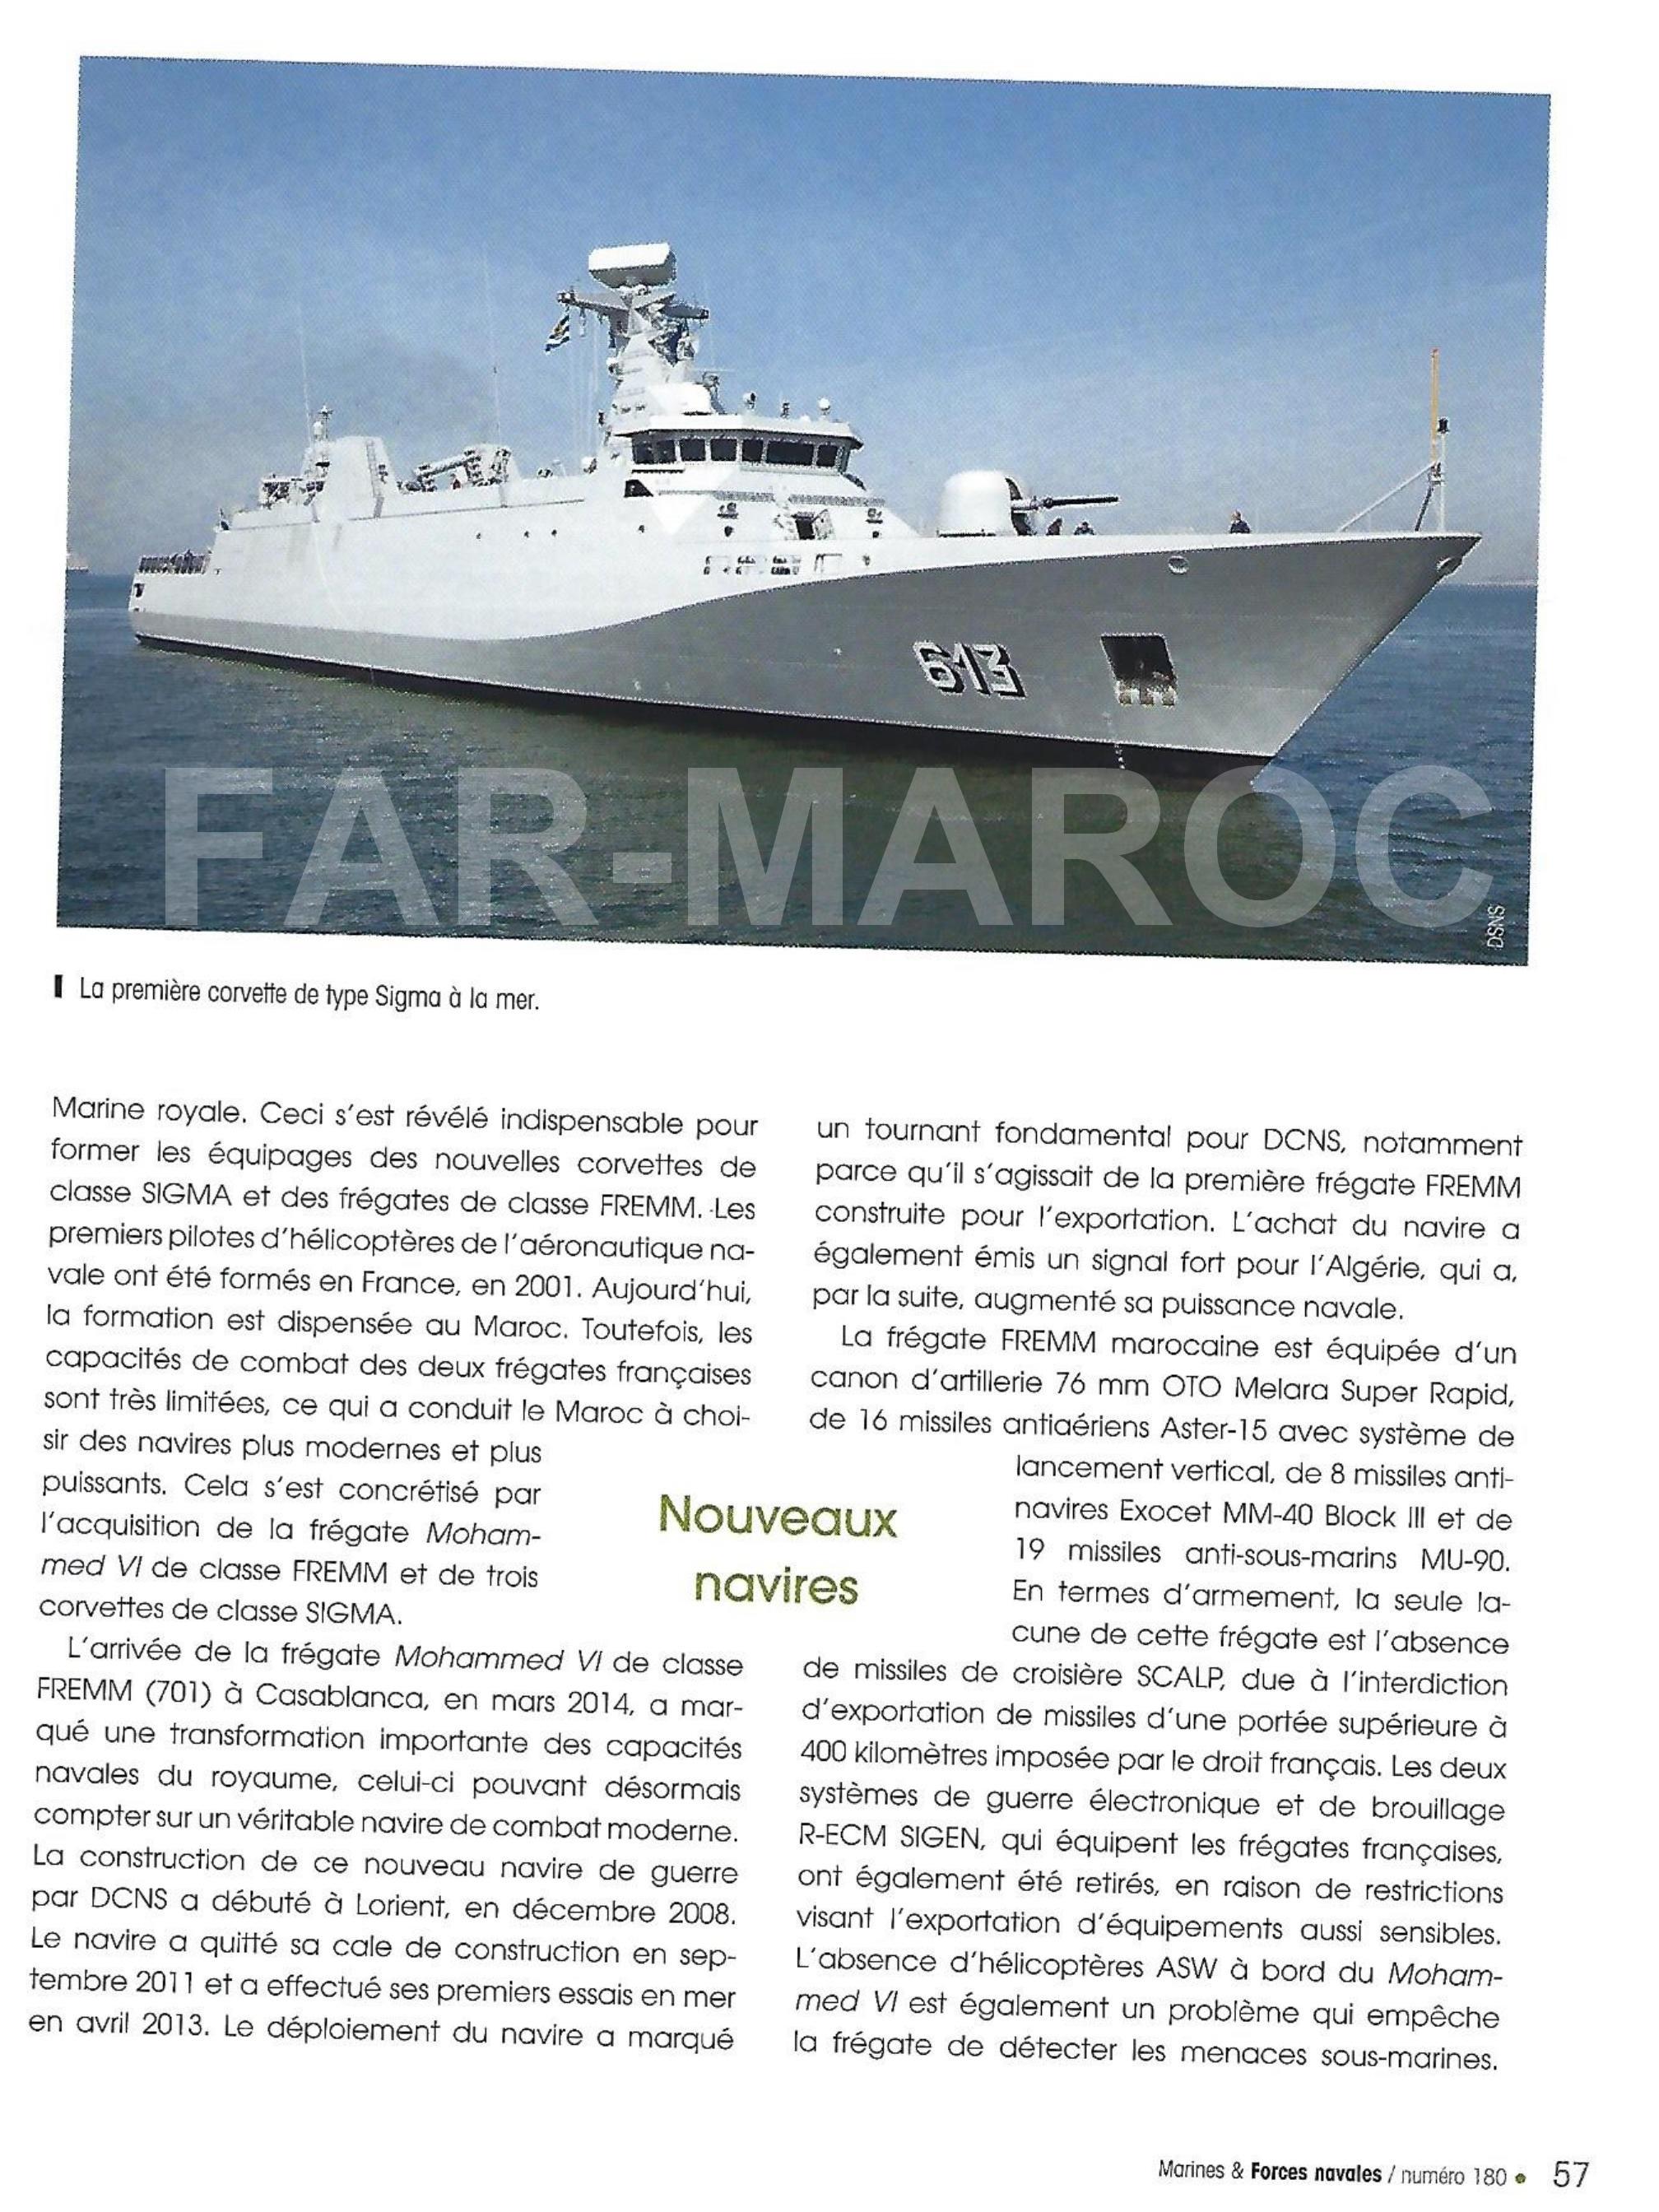 Articles à propos de la Marine Royale Marocaine 47545448432_20f6f07be5_o